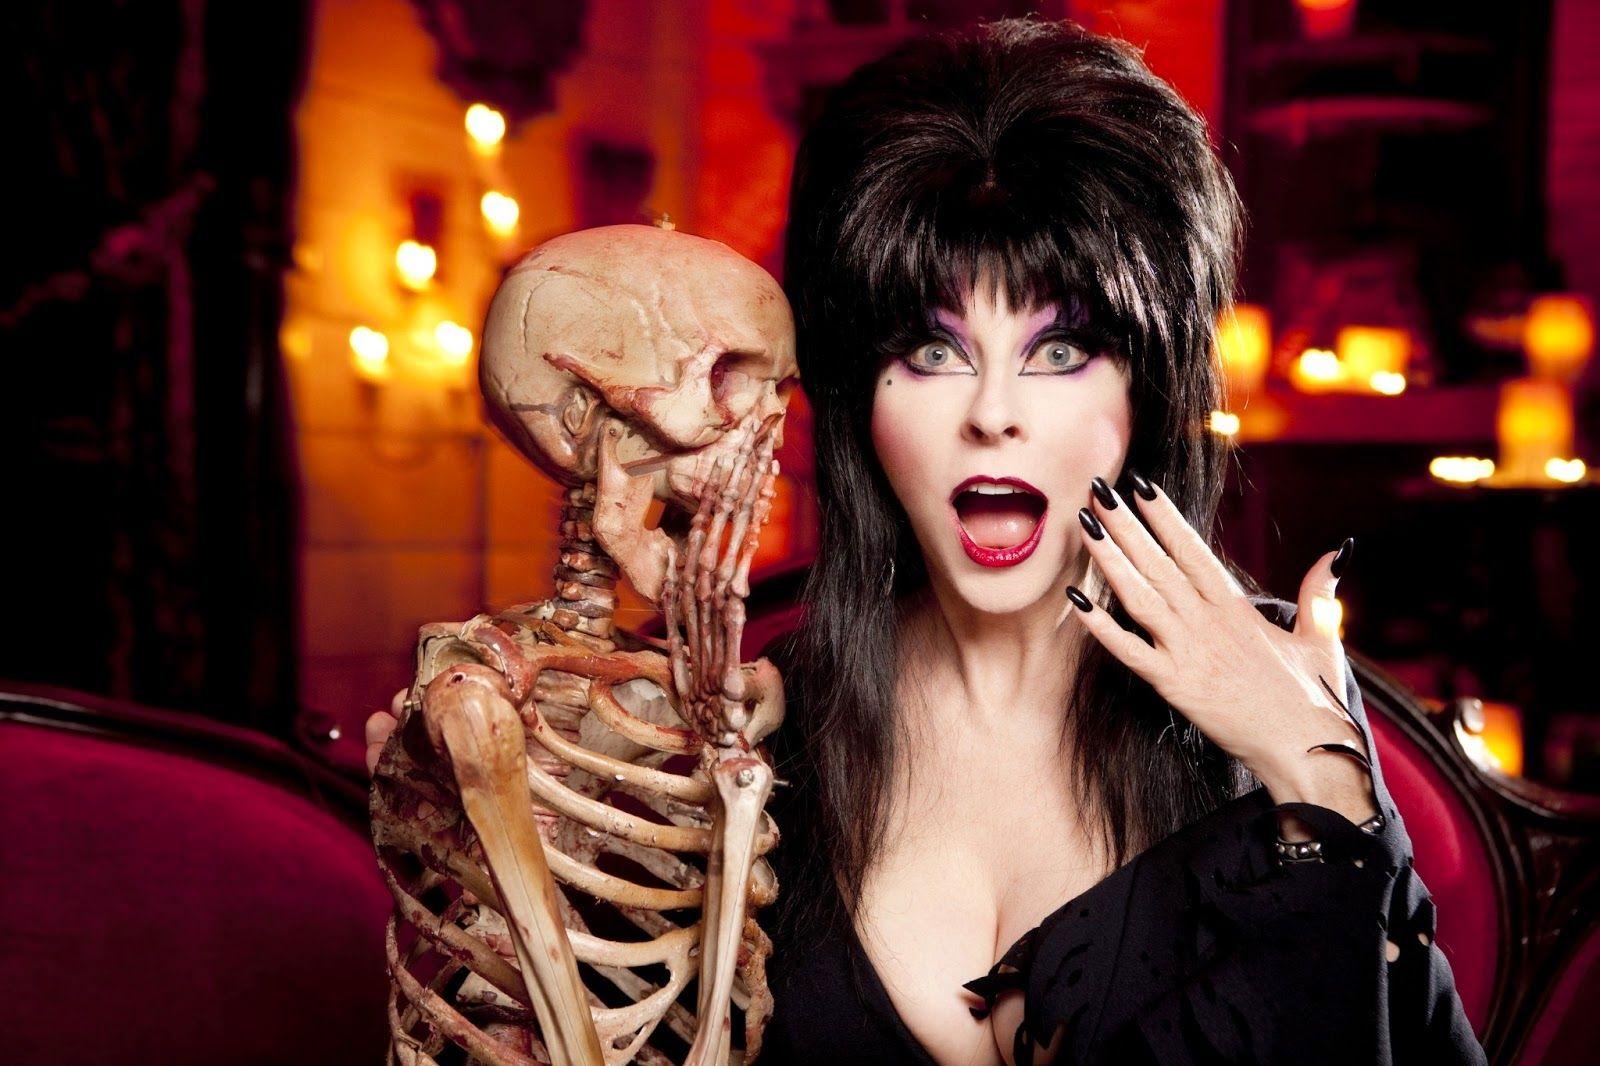 Elvira - Cassandra Peterson